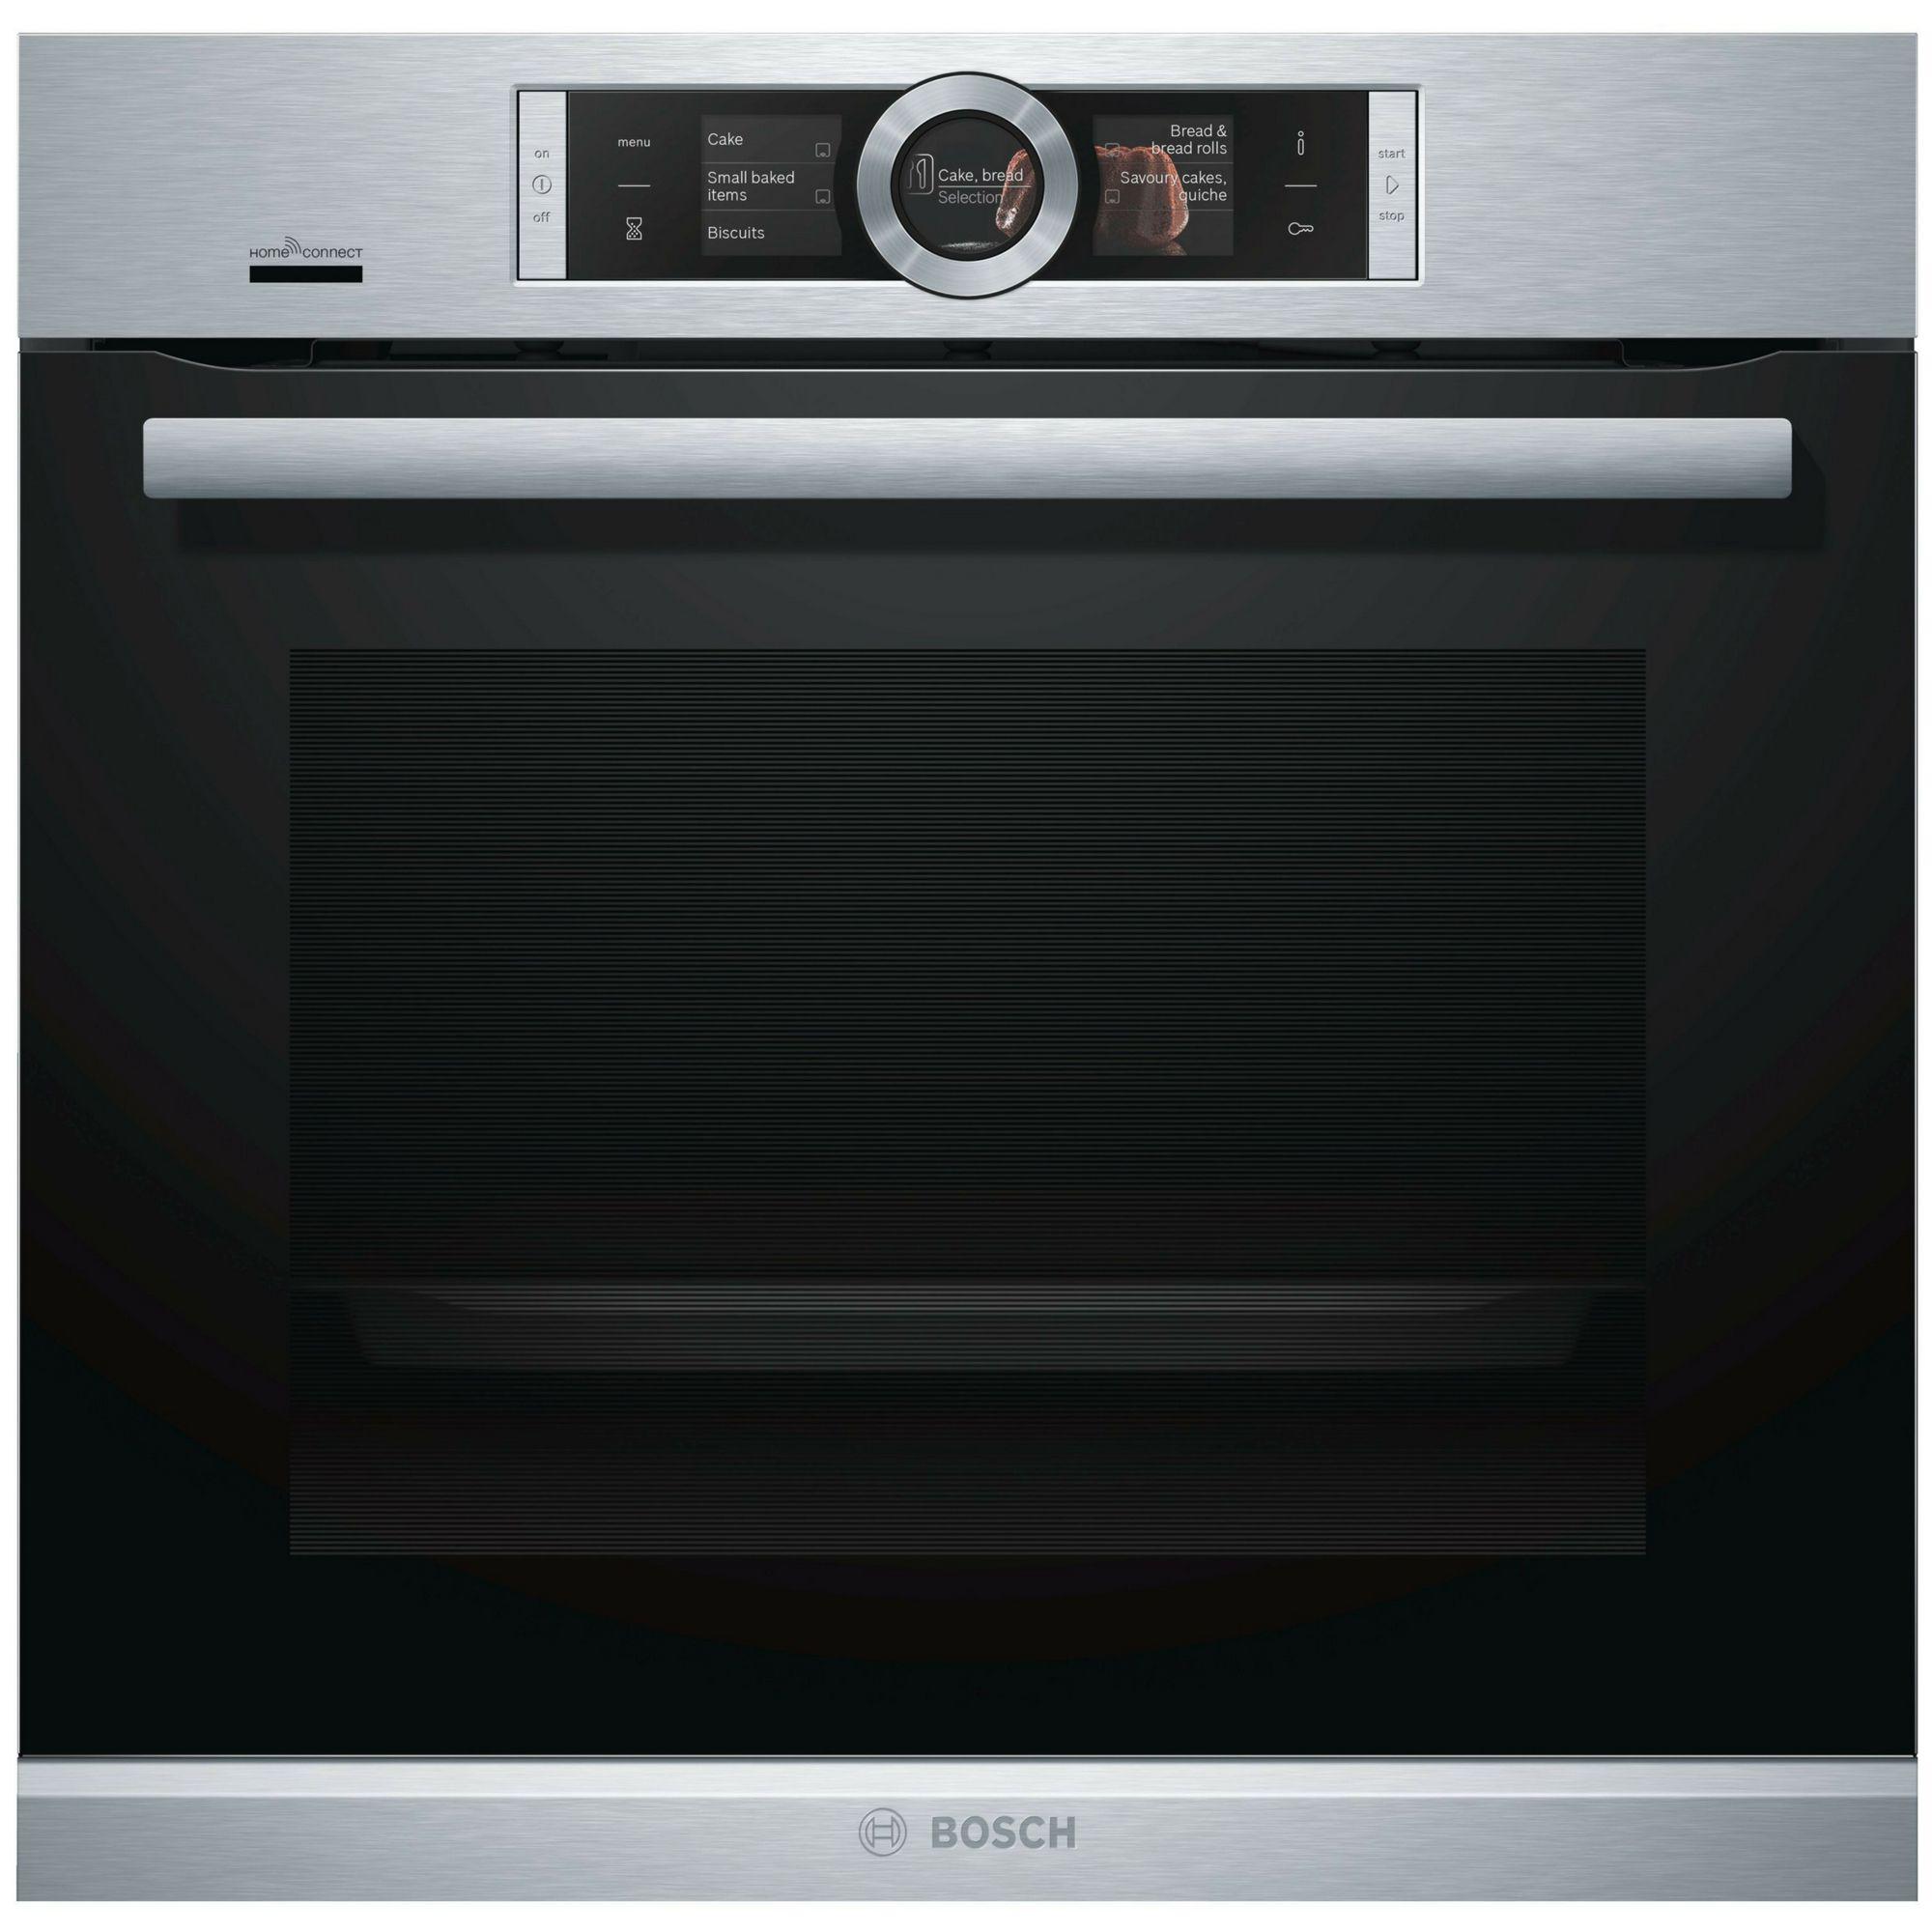 Bosch Hbg656rs6b Black Electric Single Oven